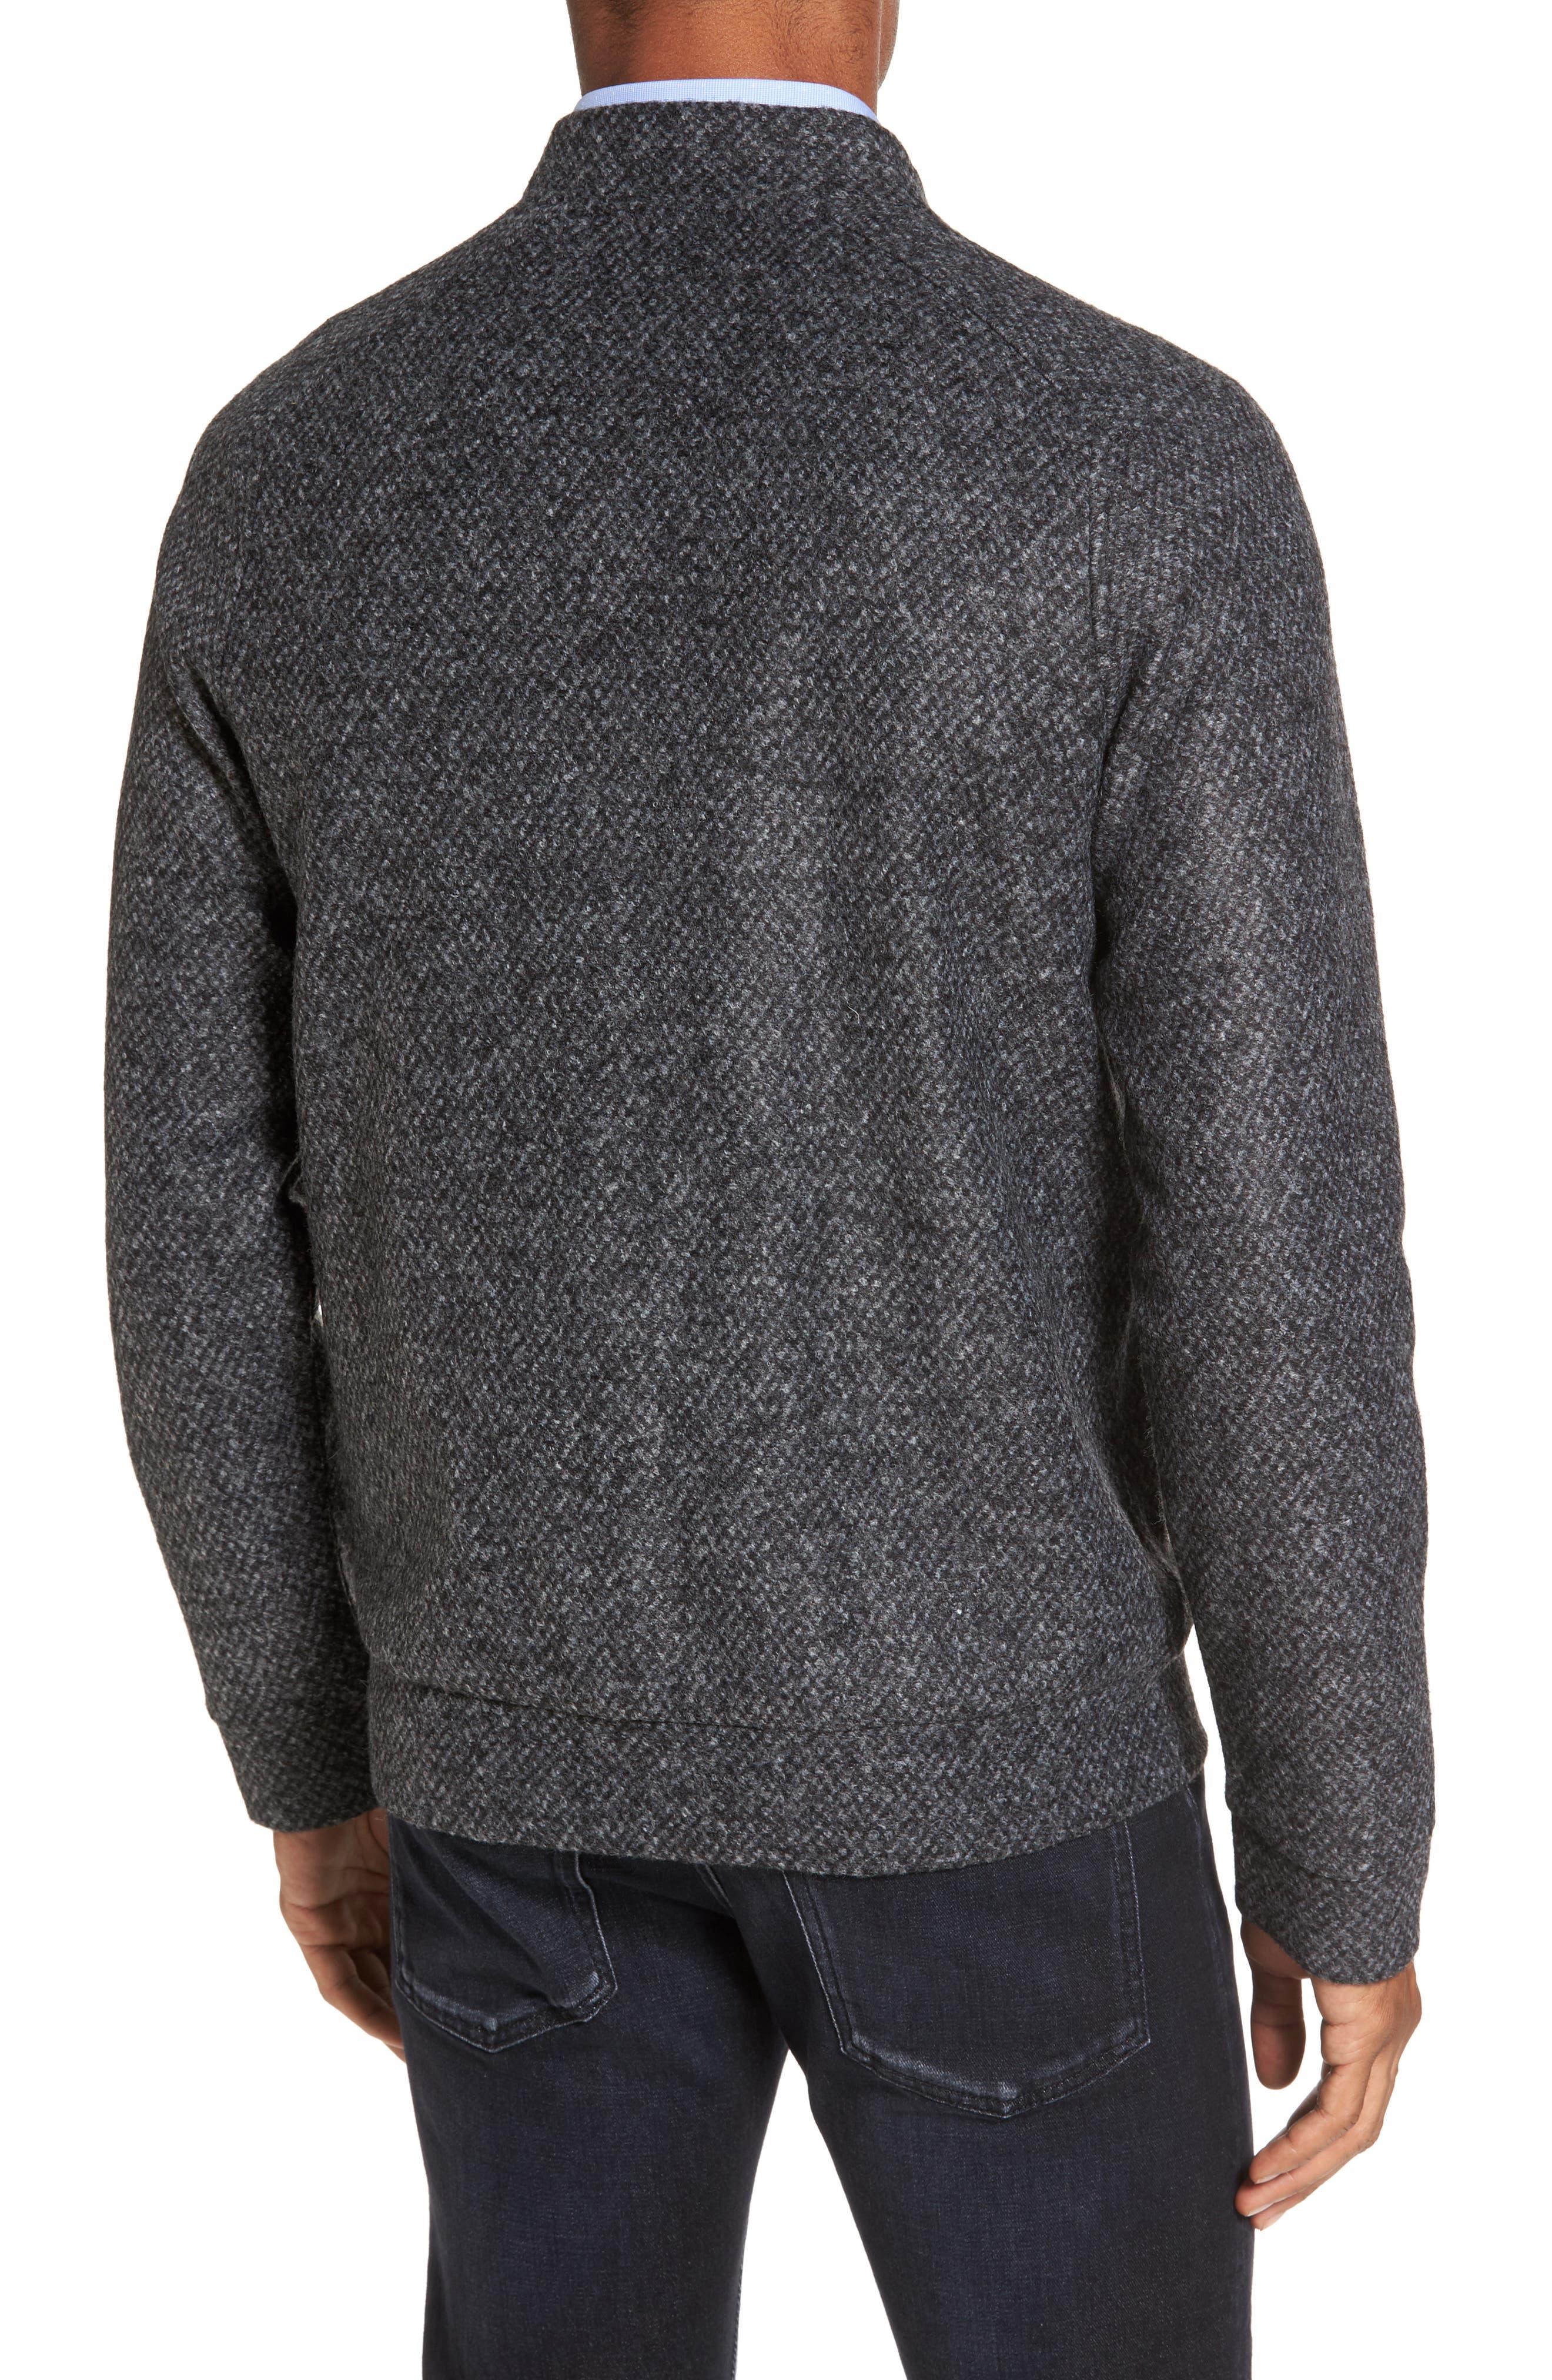 Salea Slim Fit Bomber Jacket,                             Alternate thumbnail 2, color,                             Grey